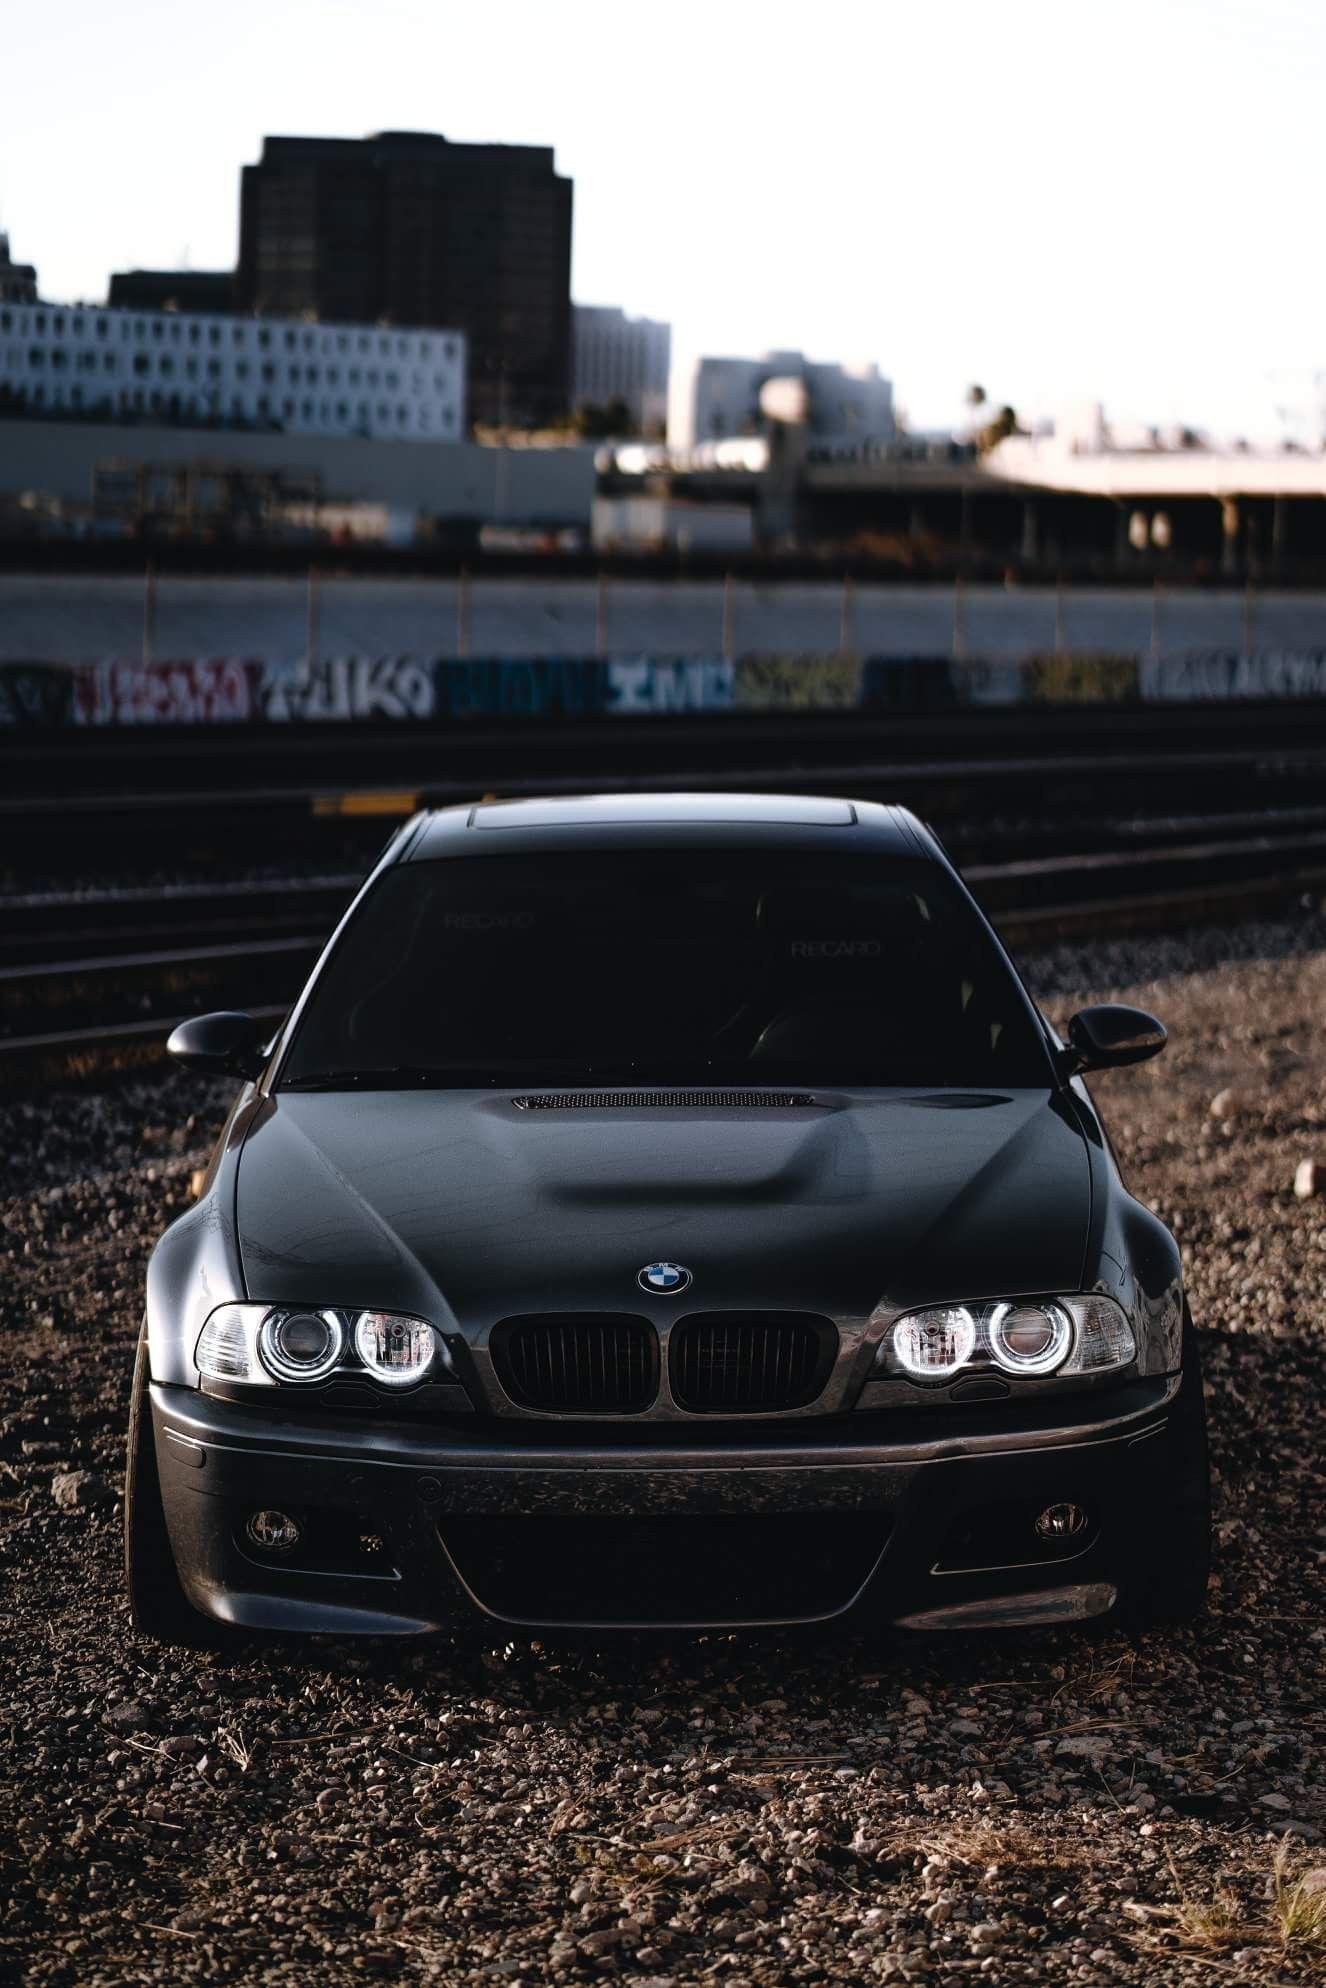 Bmw E46 M3 Gre Bmw E46 M3 Grey Bmw E46 Sedan Bmw Bmw Wallpapers